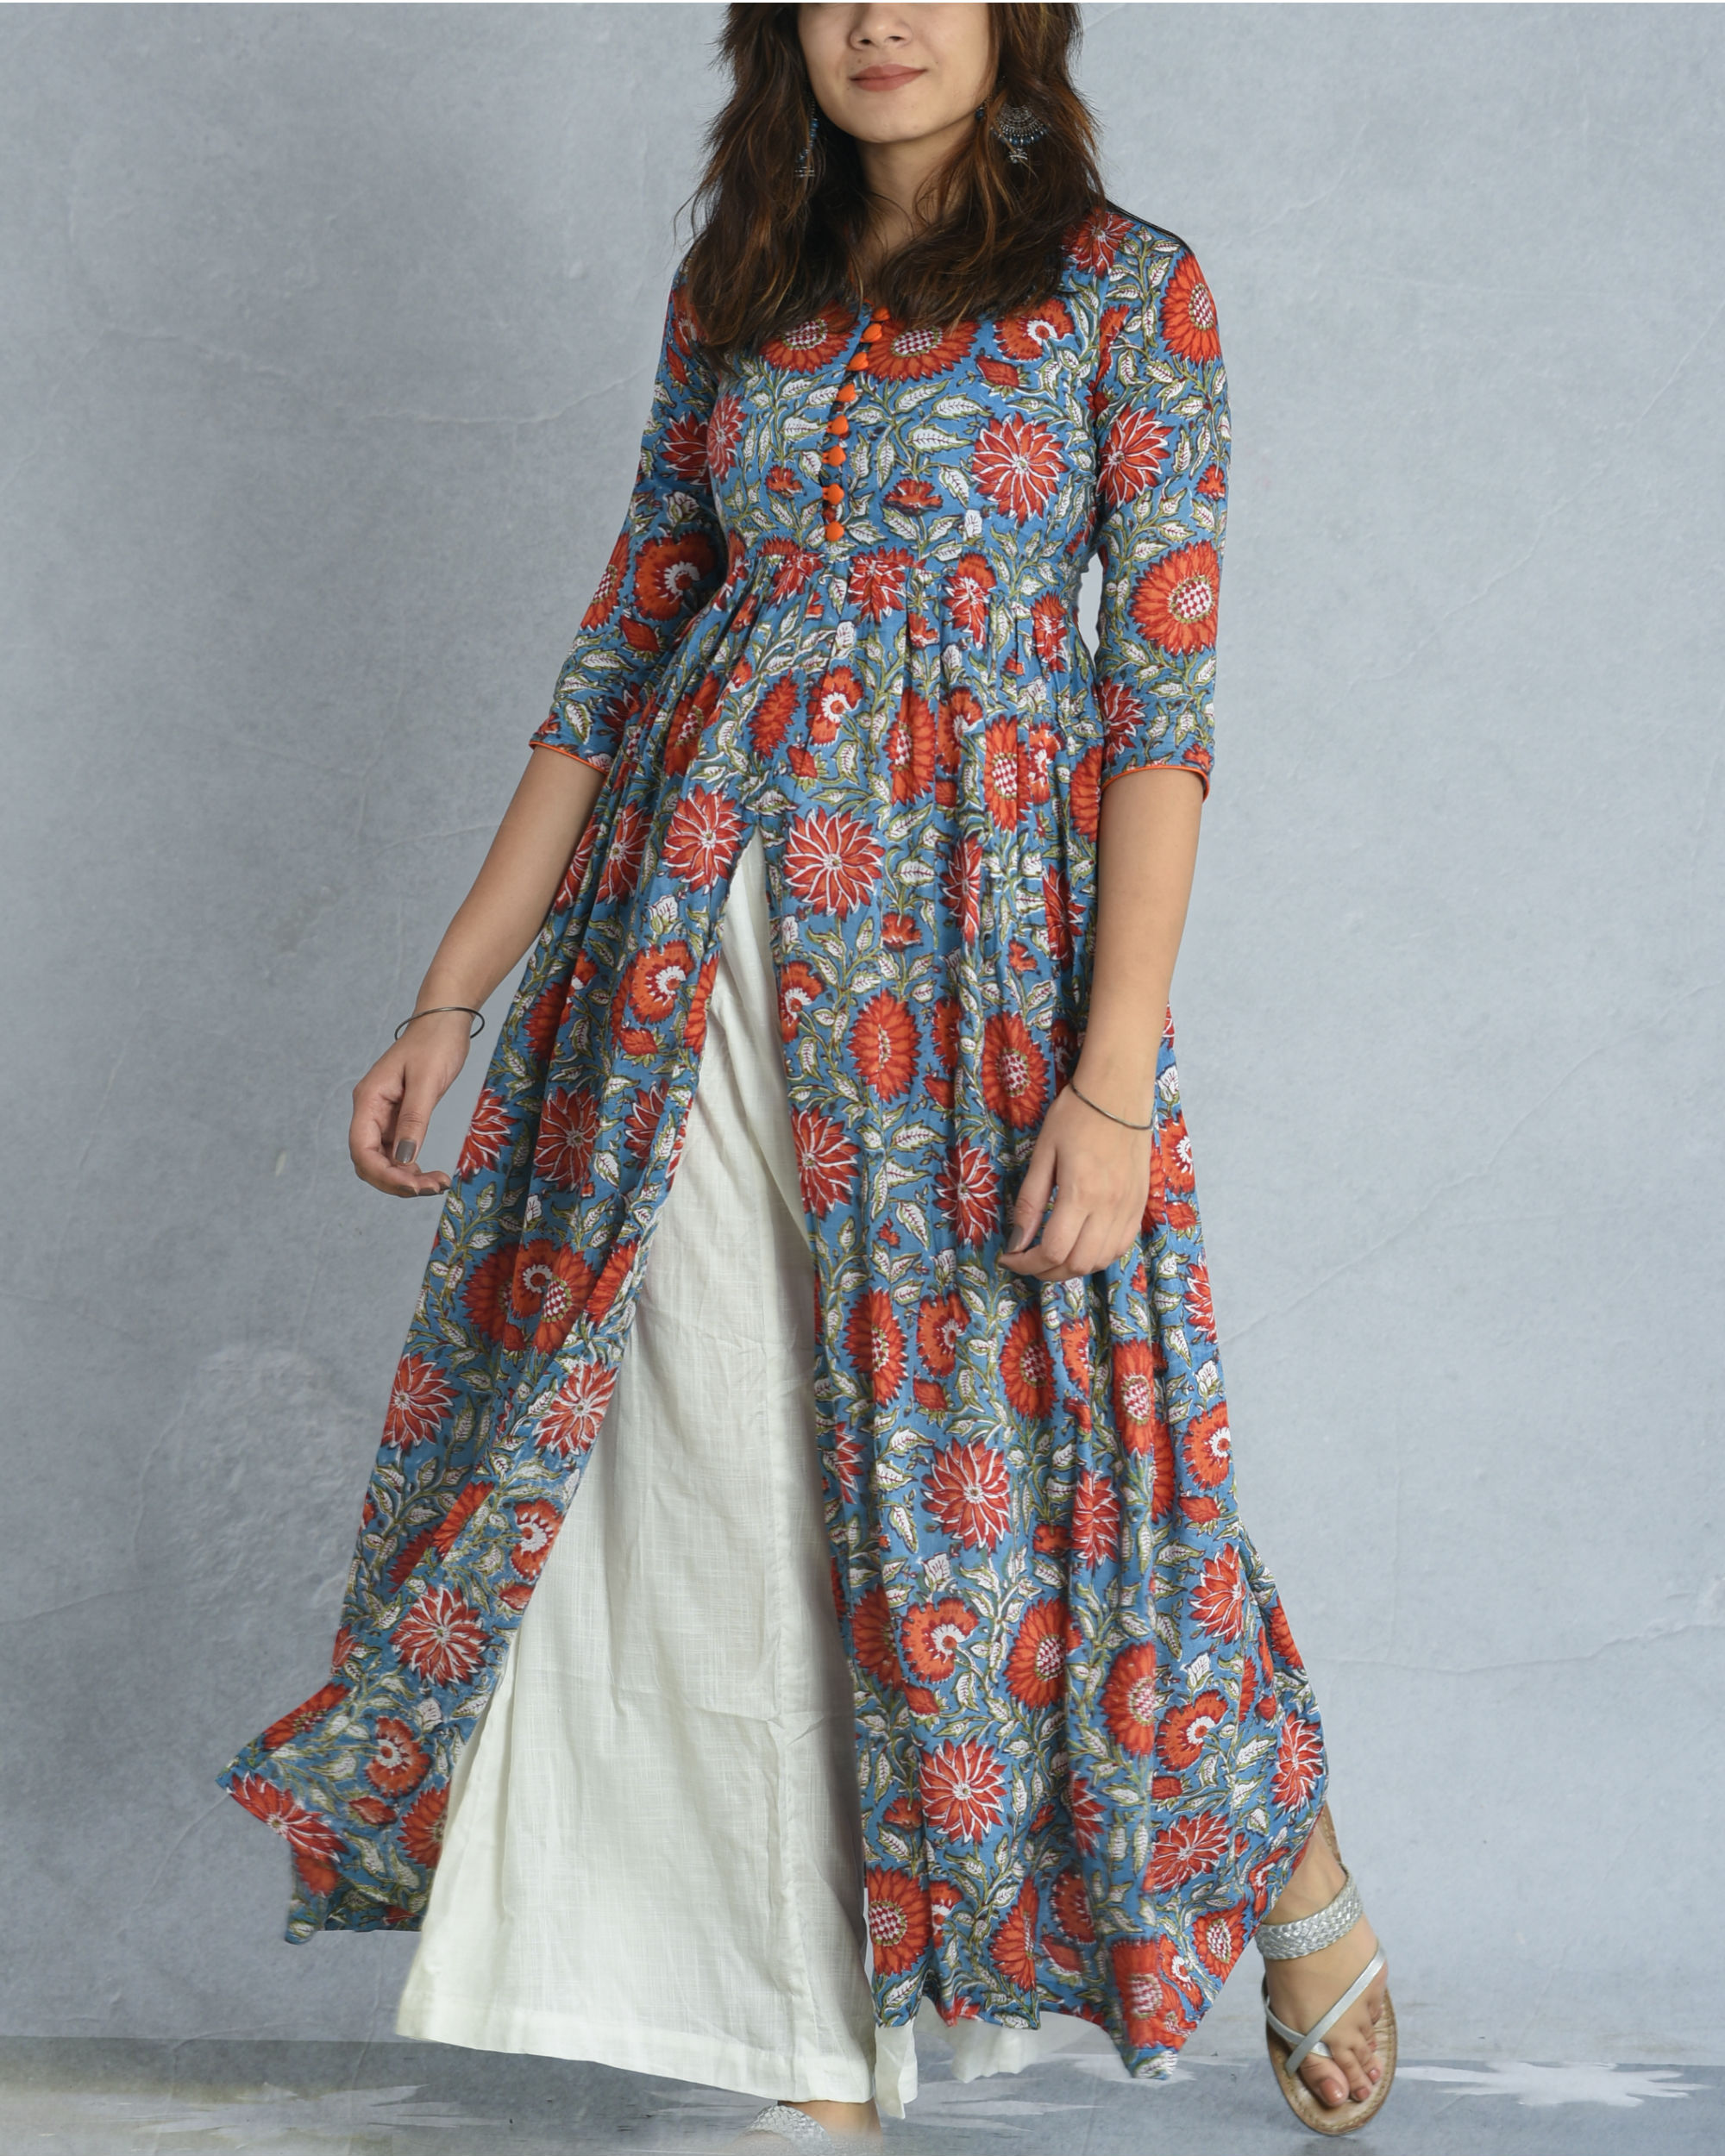 Teal floral cape